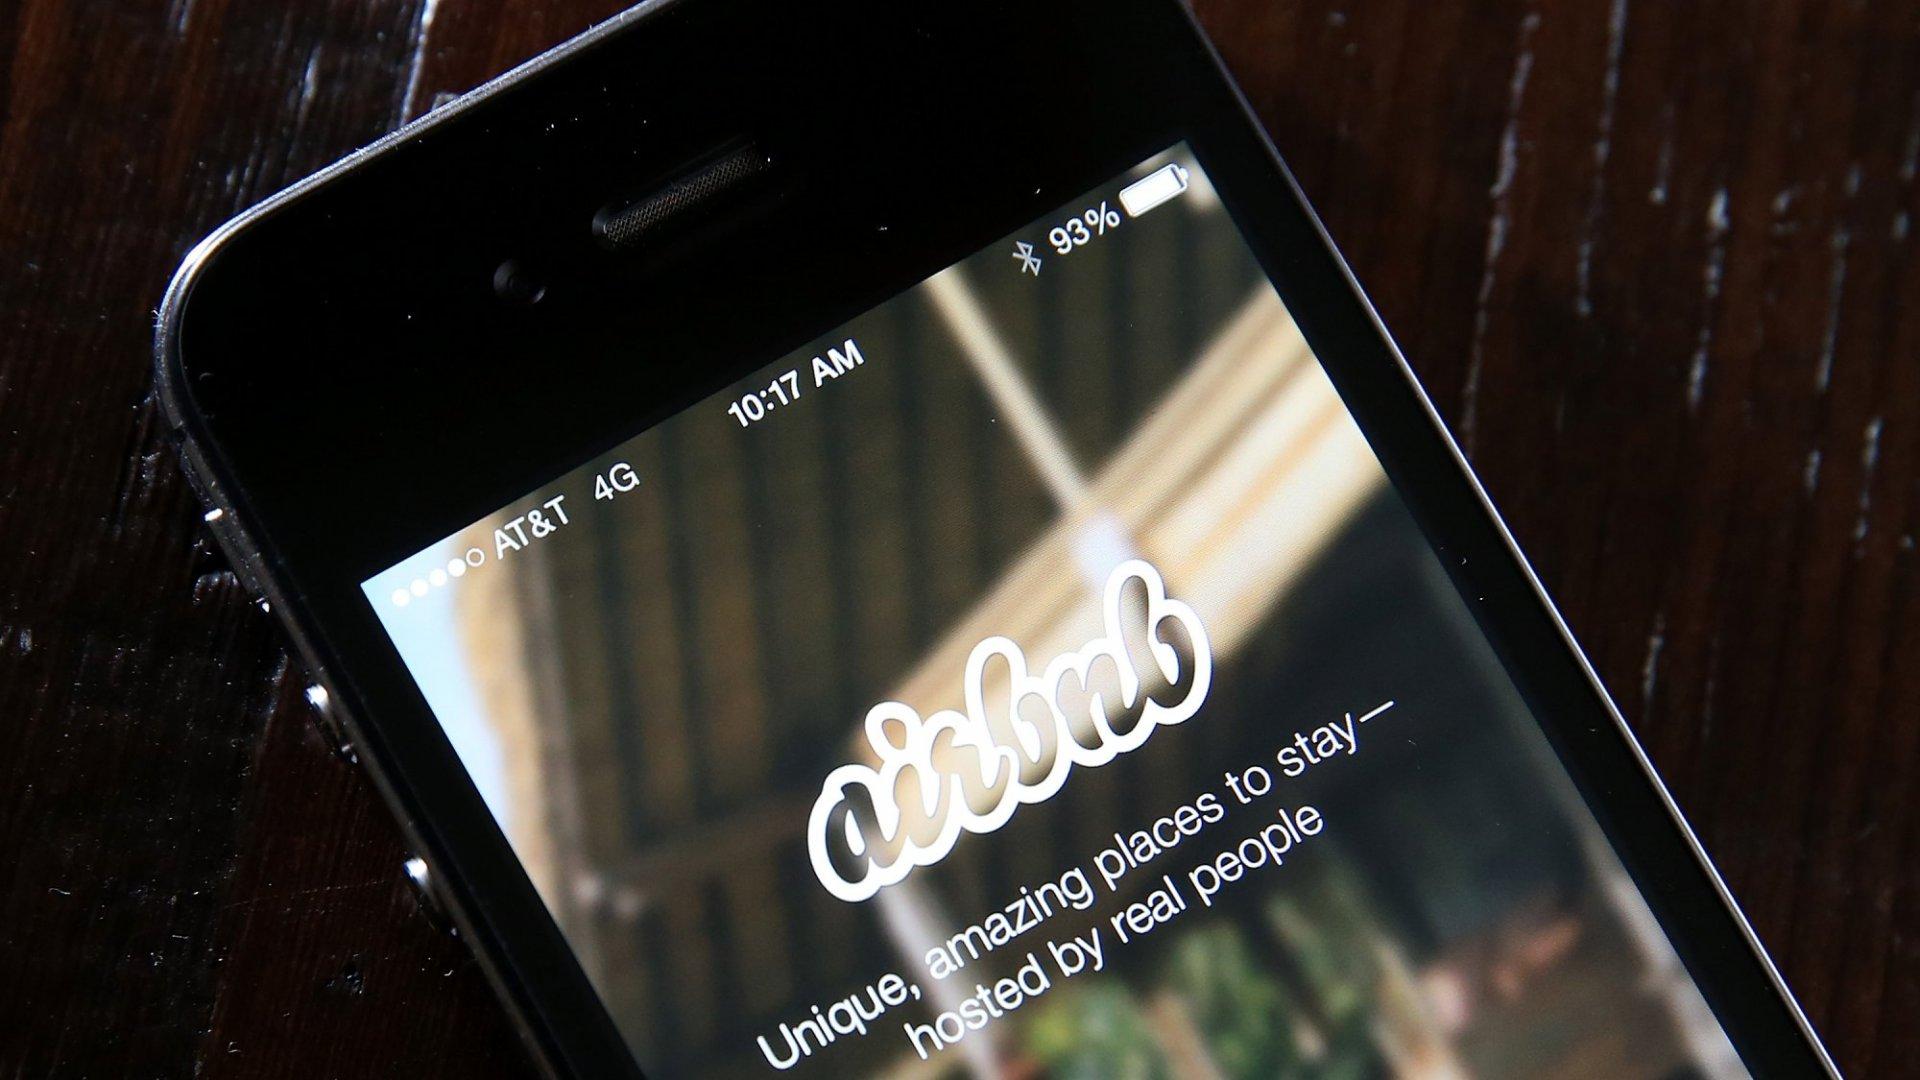 Airbnb: We Have 'Zero Tolerance' for Discrimination on Our Platform